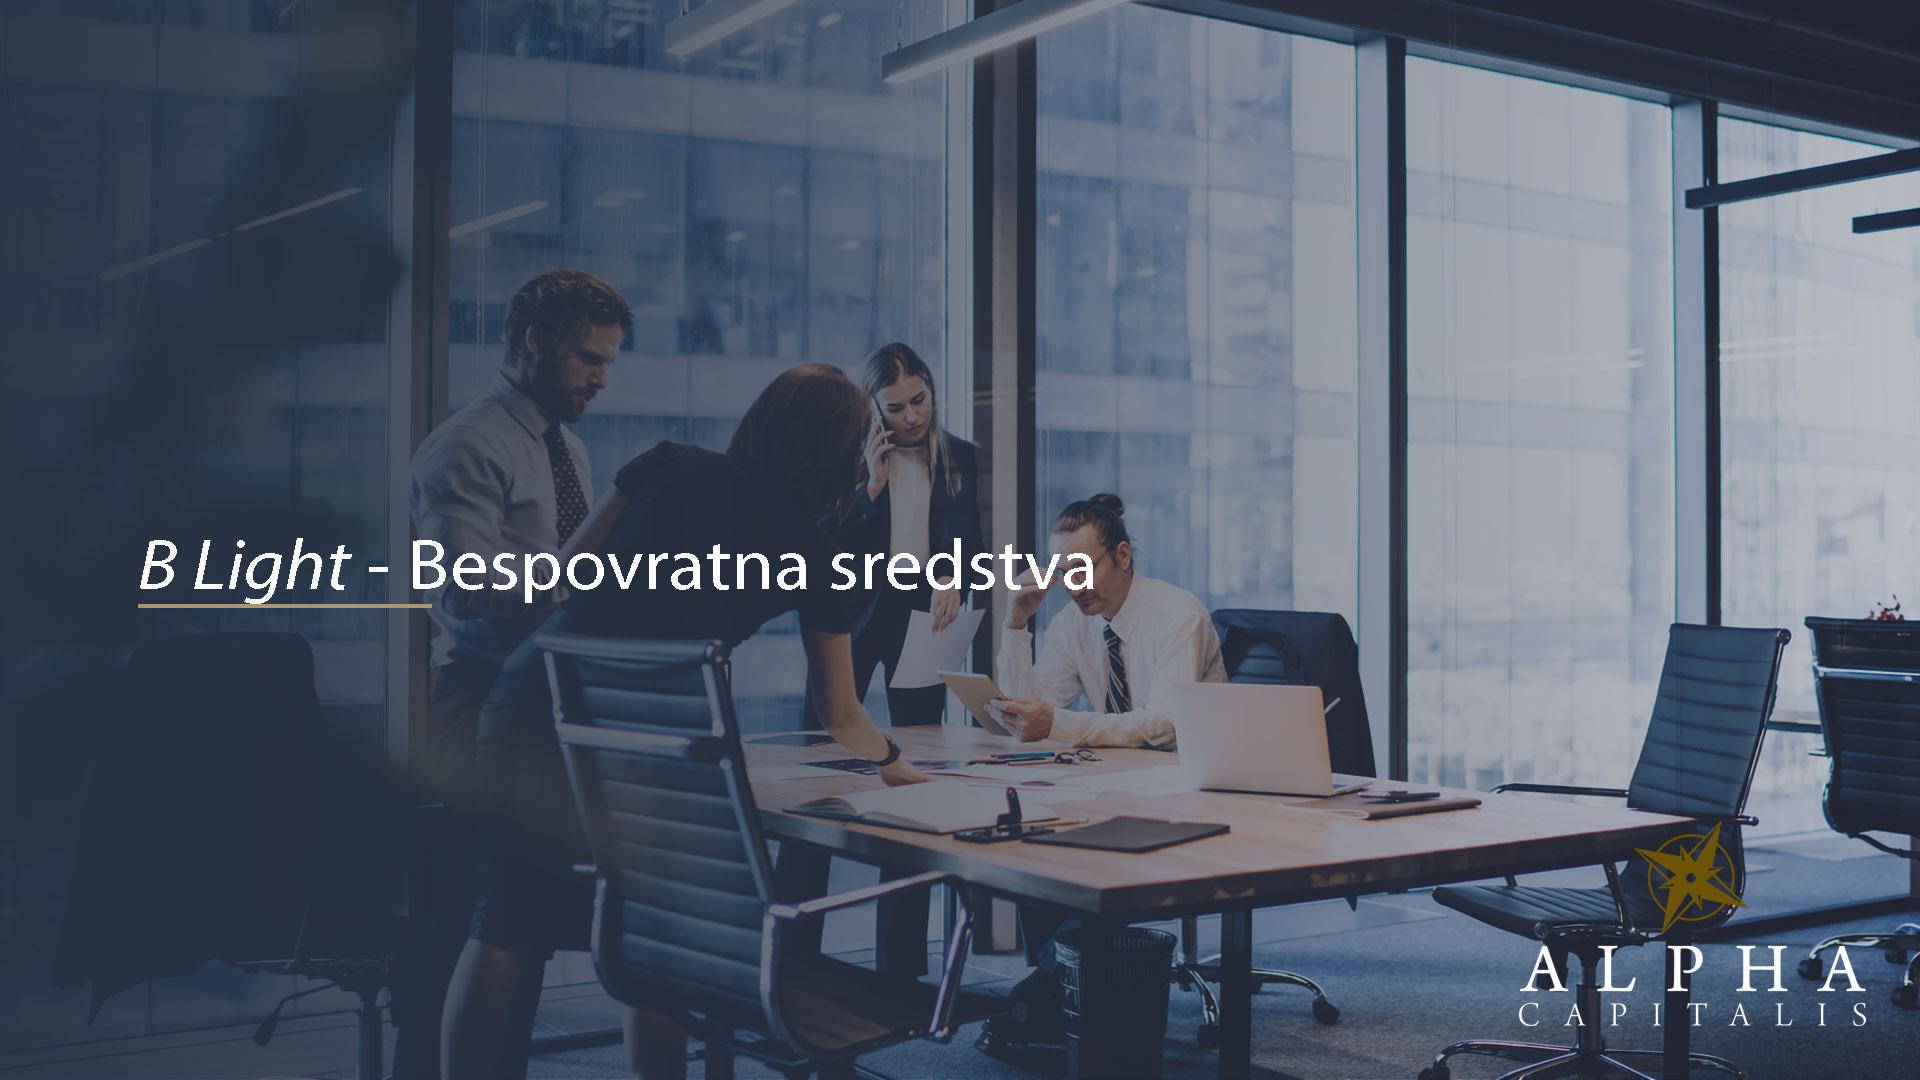 alpha-capitalis-novosti_b-light-bespovratna-sredstva